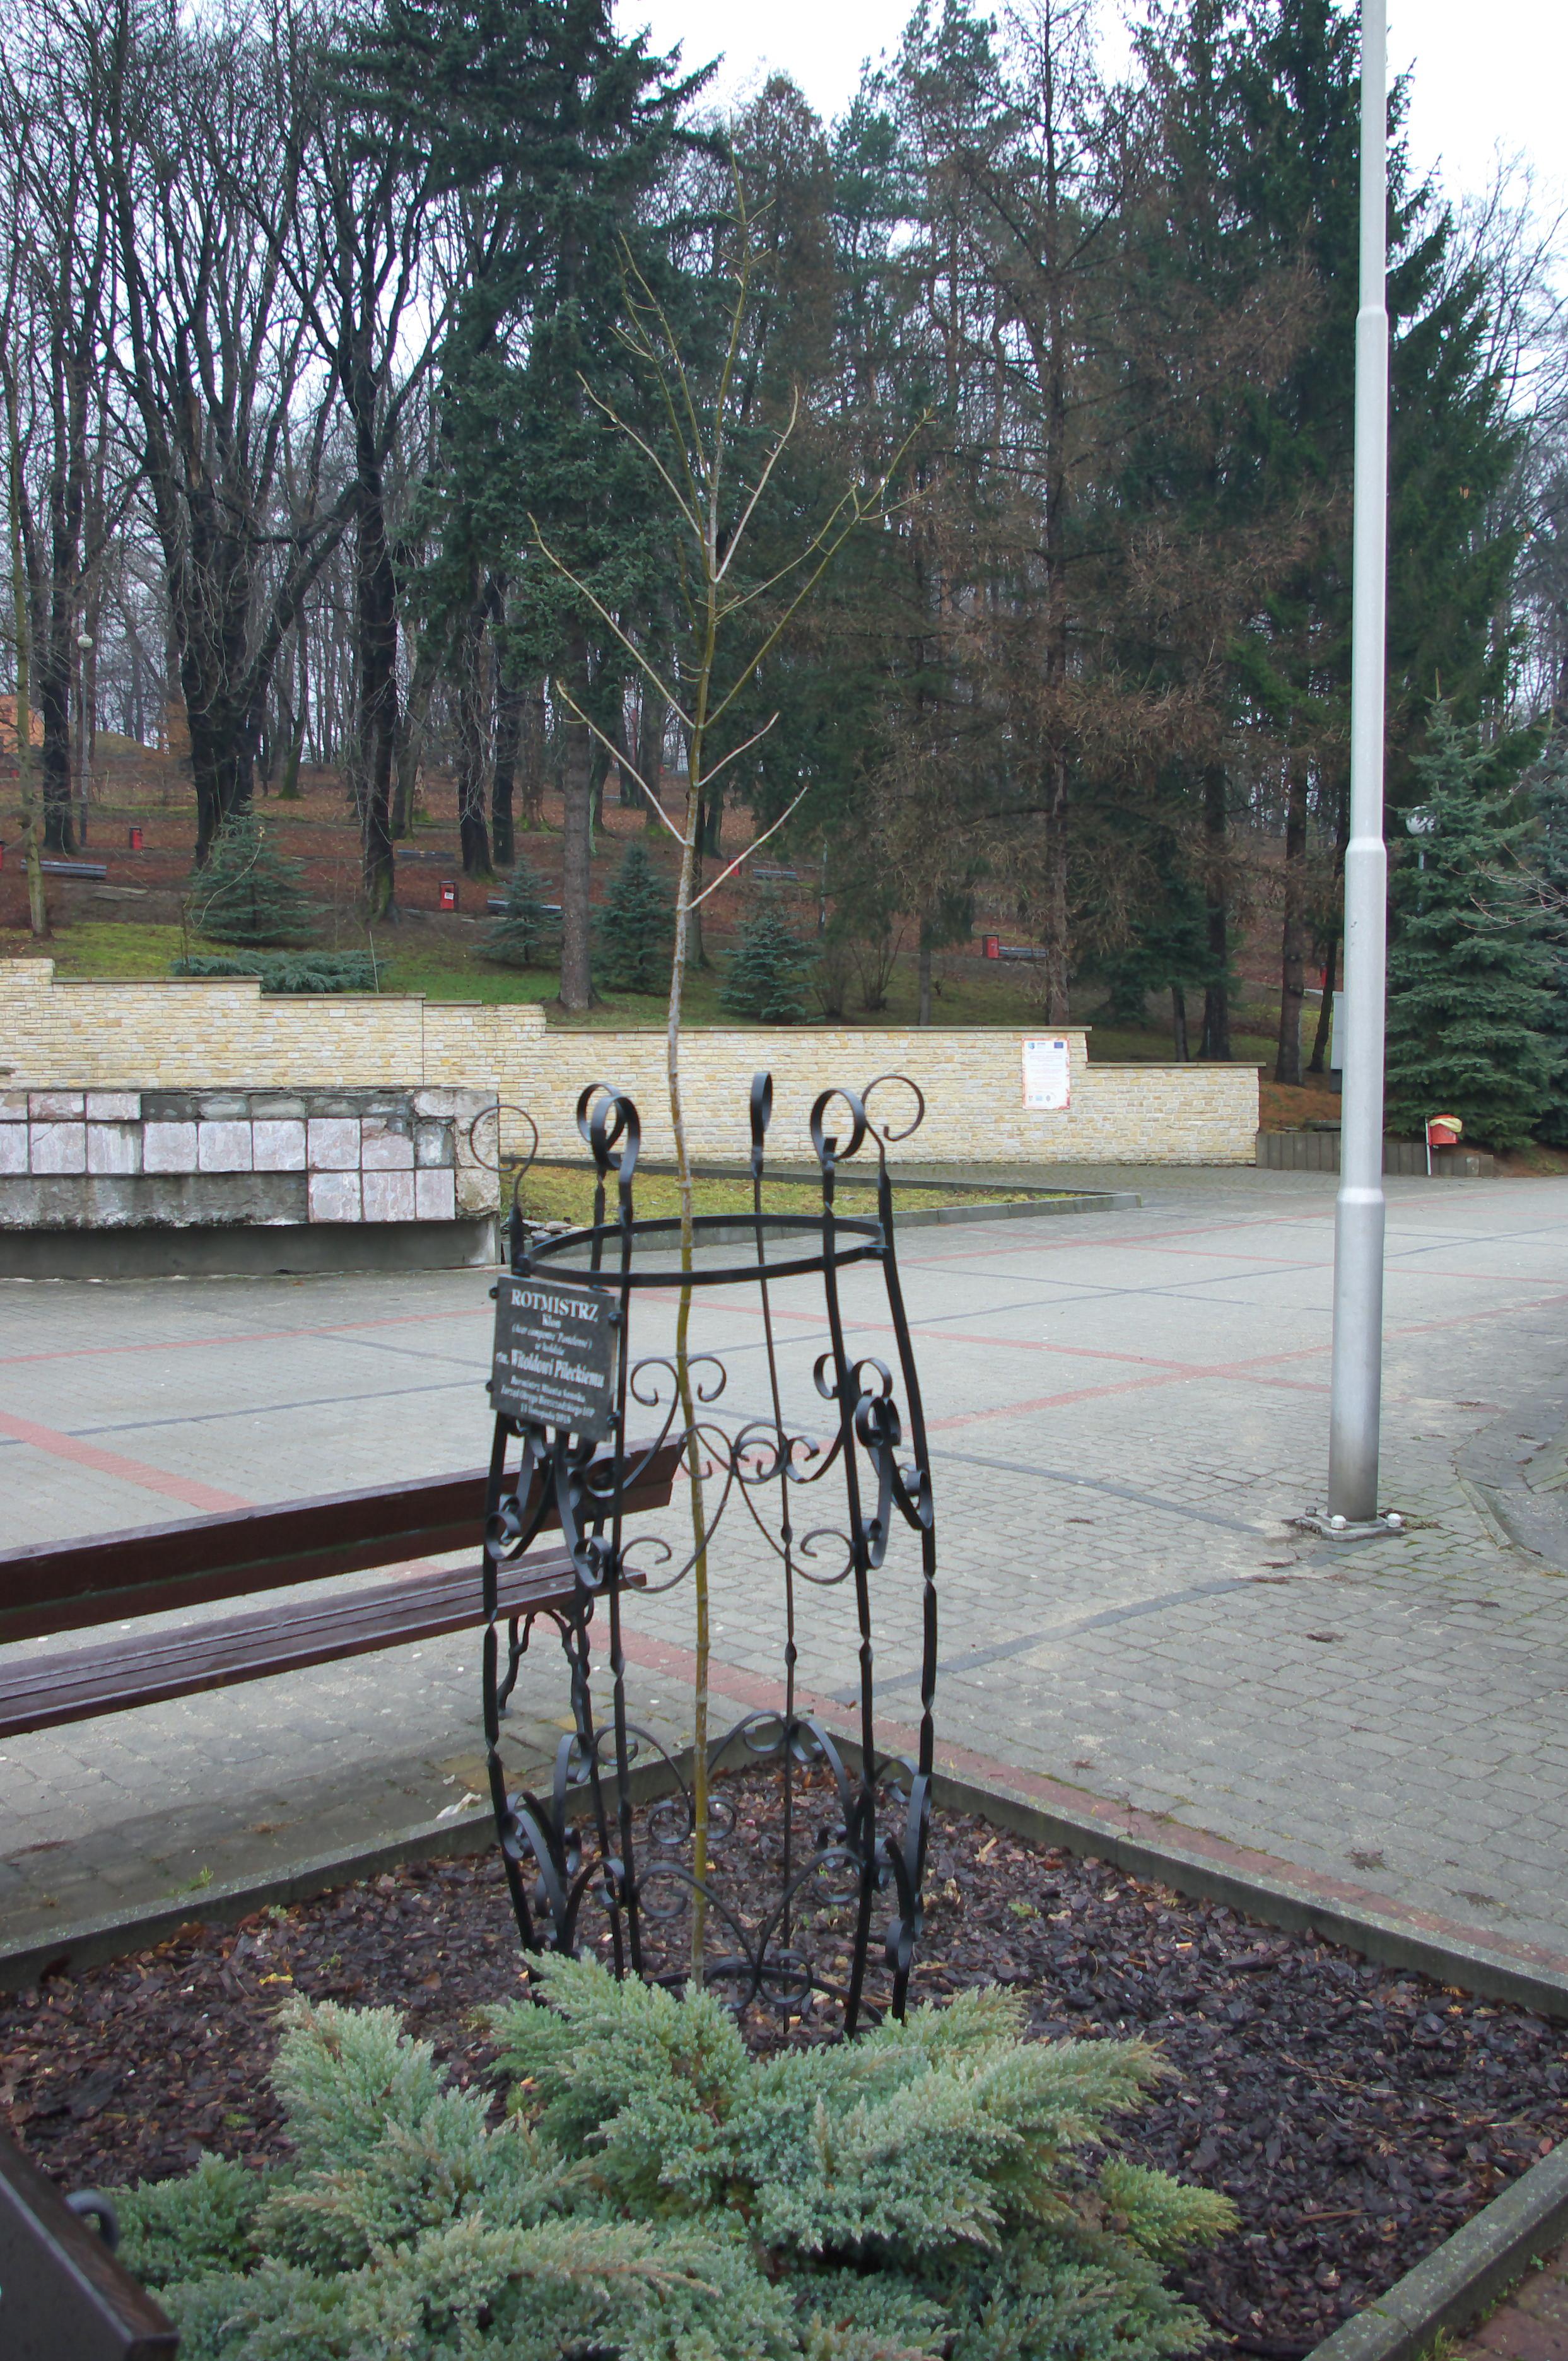 Fileacer Campestre Postelense Rotmistrz To Witold Pilecki At